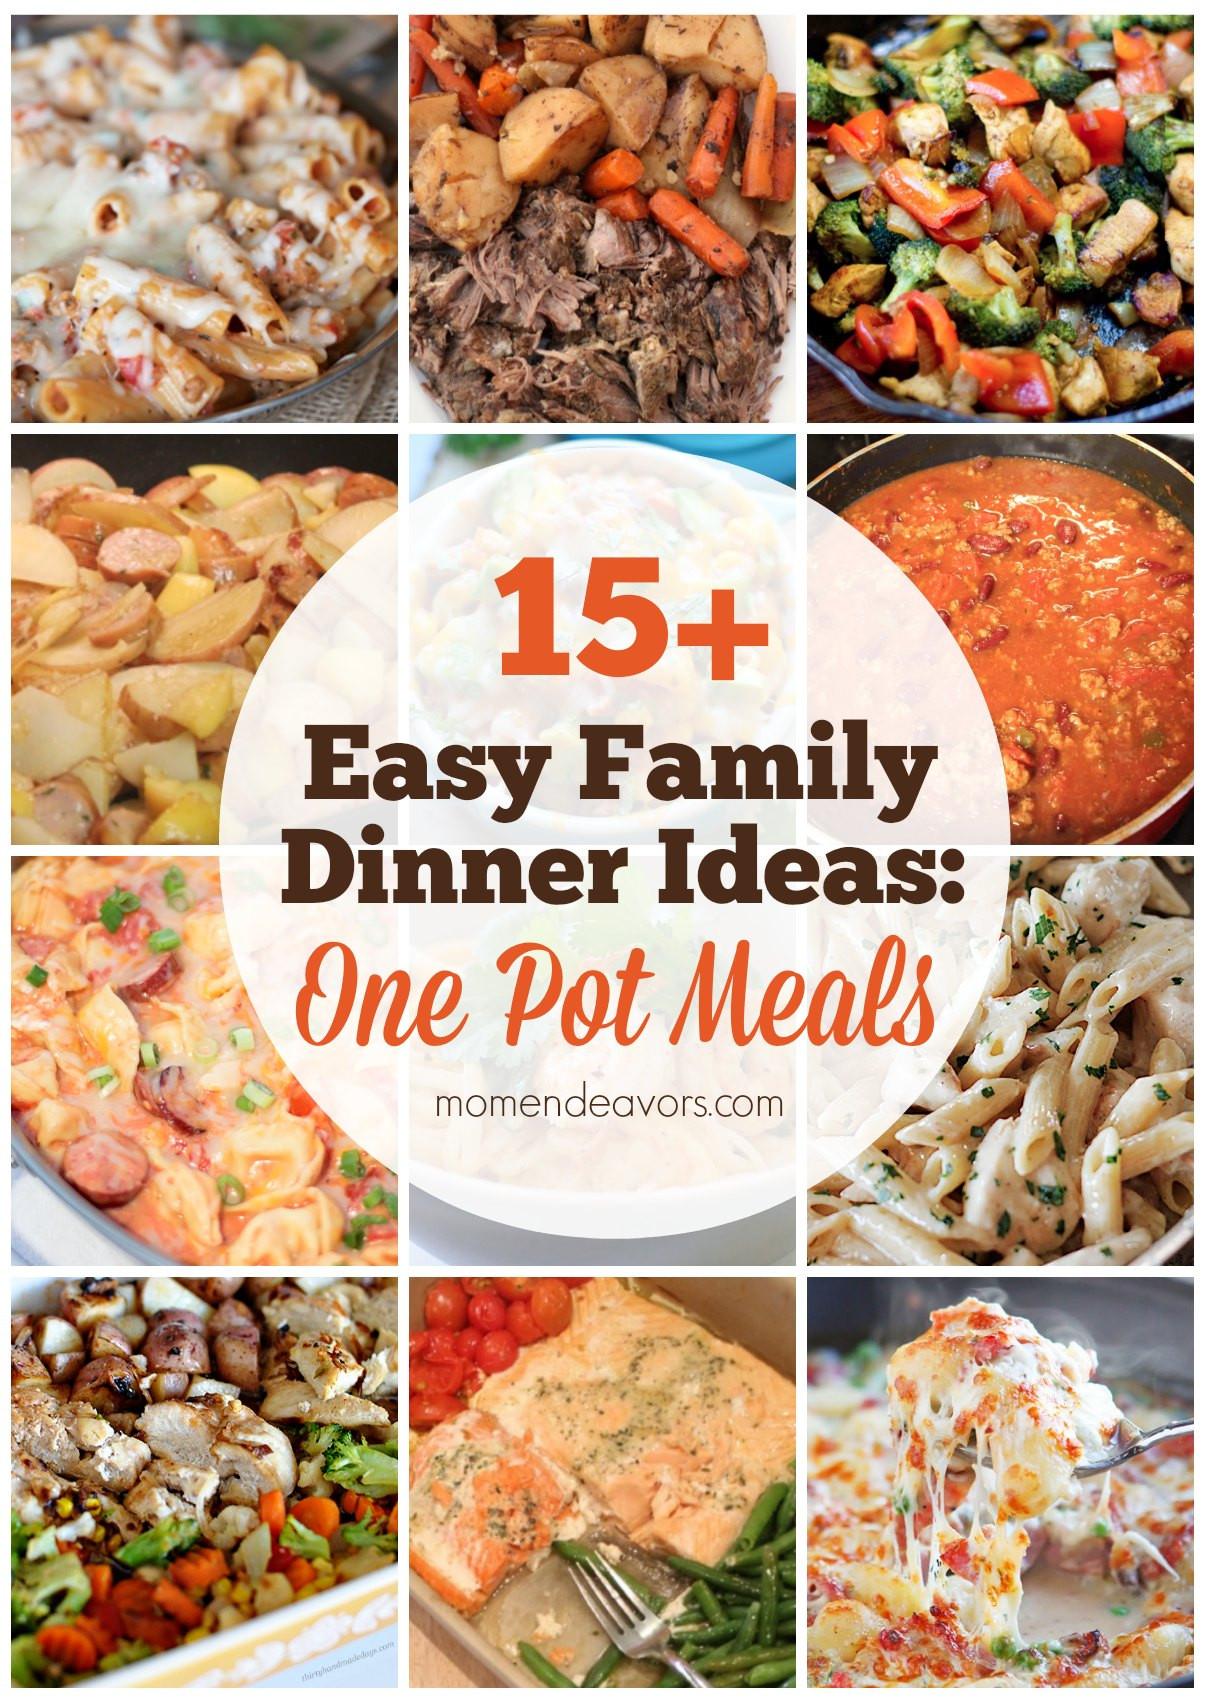 Easy Dinners For One  15 Easy e Pot Family Dinners